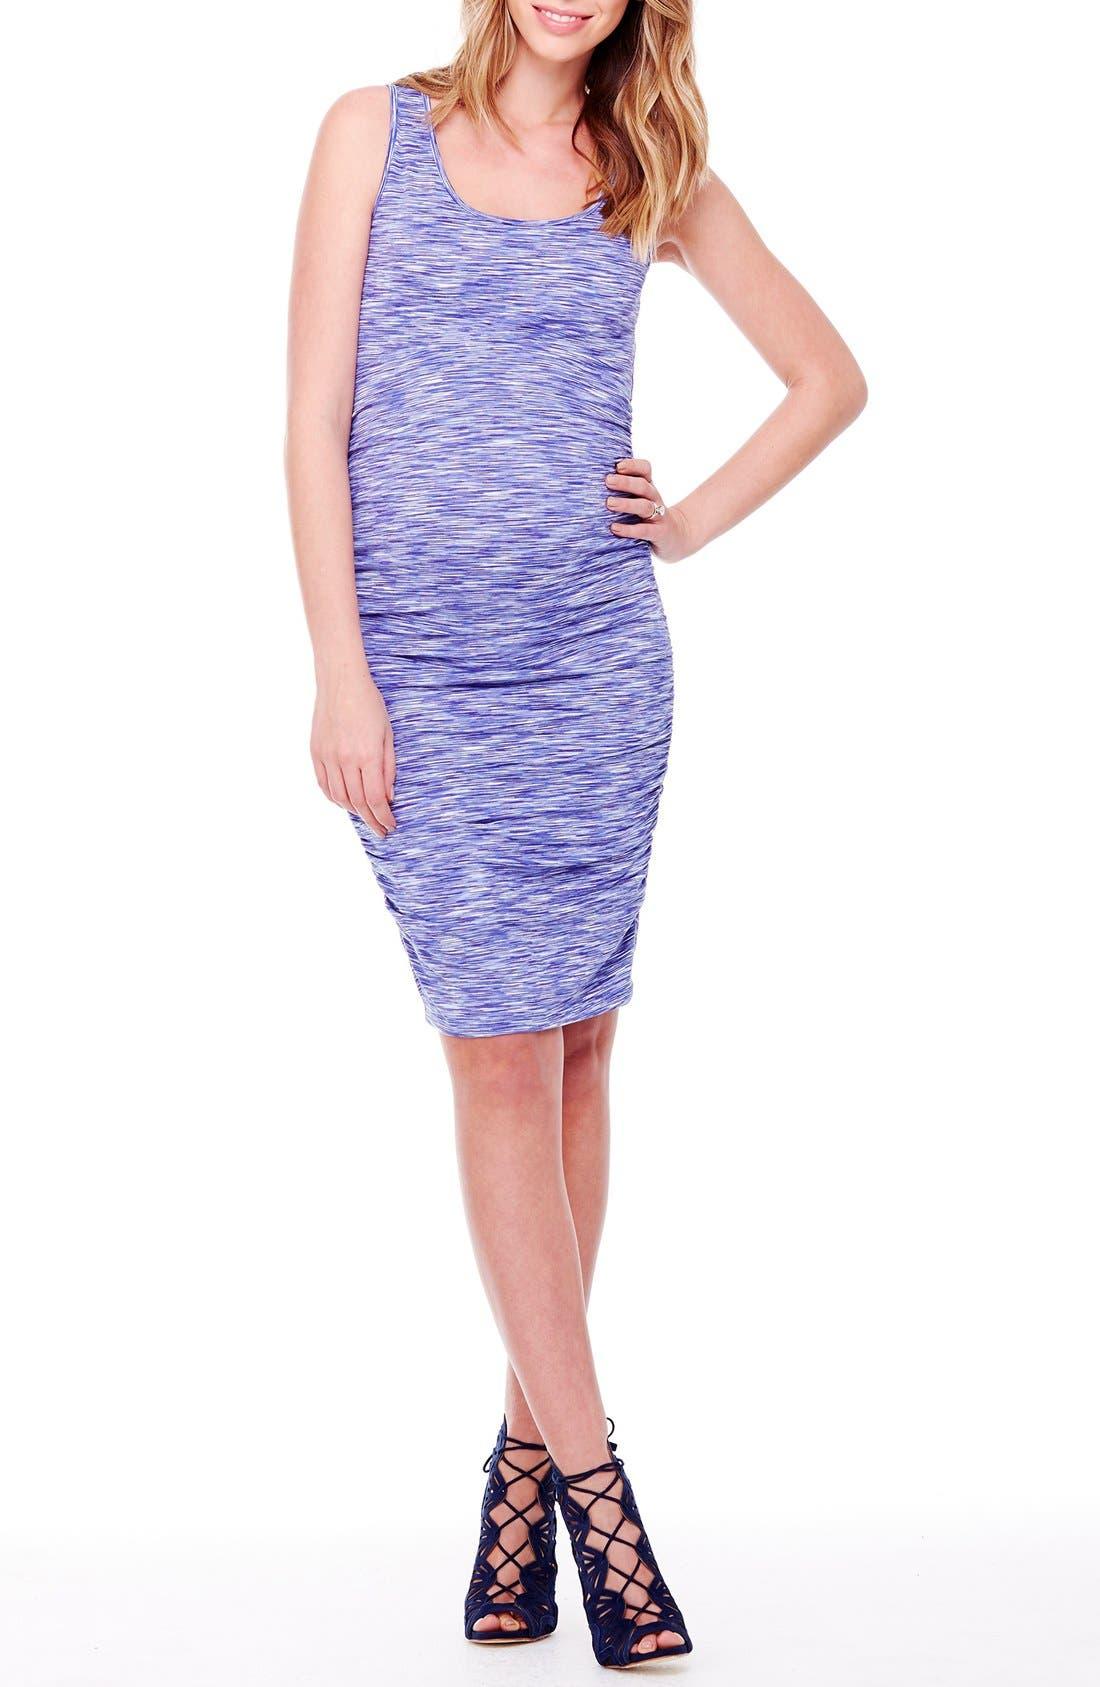 Space Dye Ruched Maternity Tank Dress,                             Main thumbnail 1, color,                             COBALT SPACE DYE